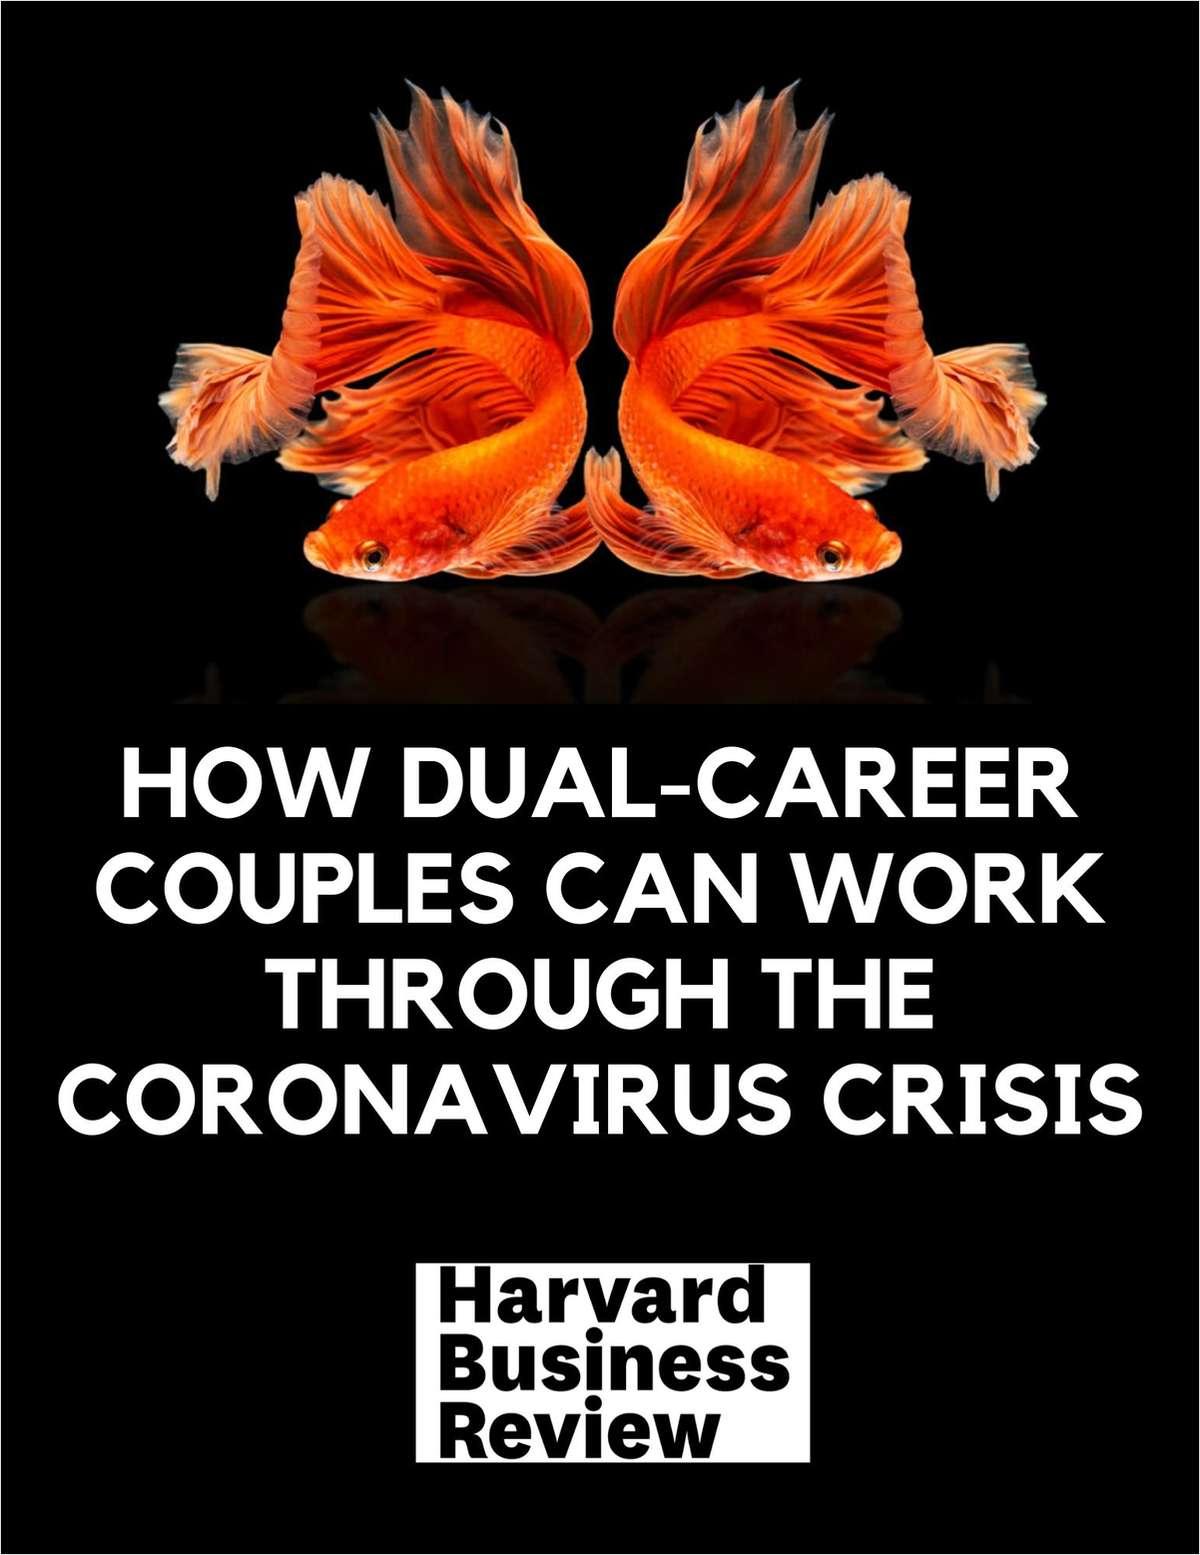 How Dual-Career Couples Can Work Through the Coronavirus Crisis